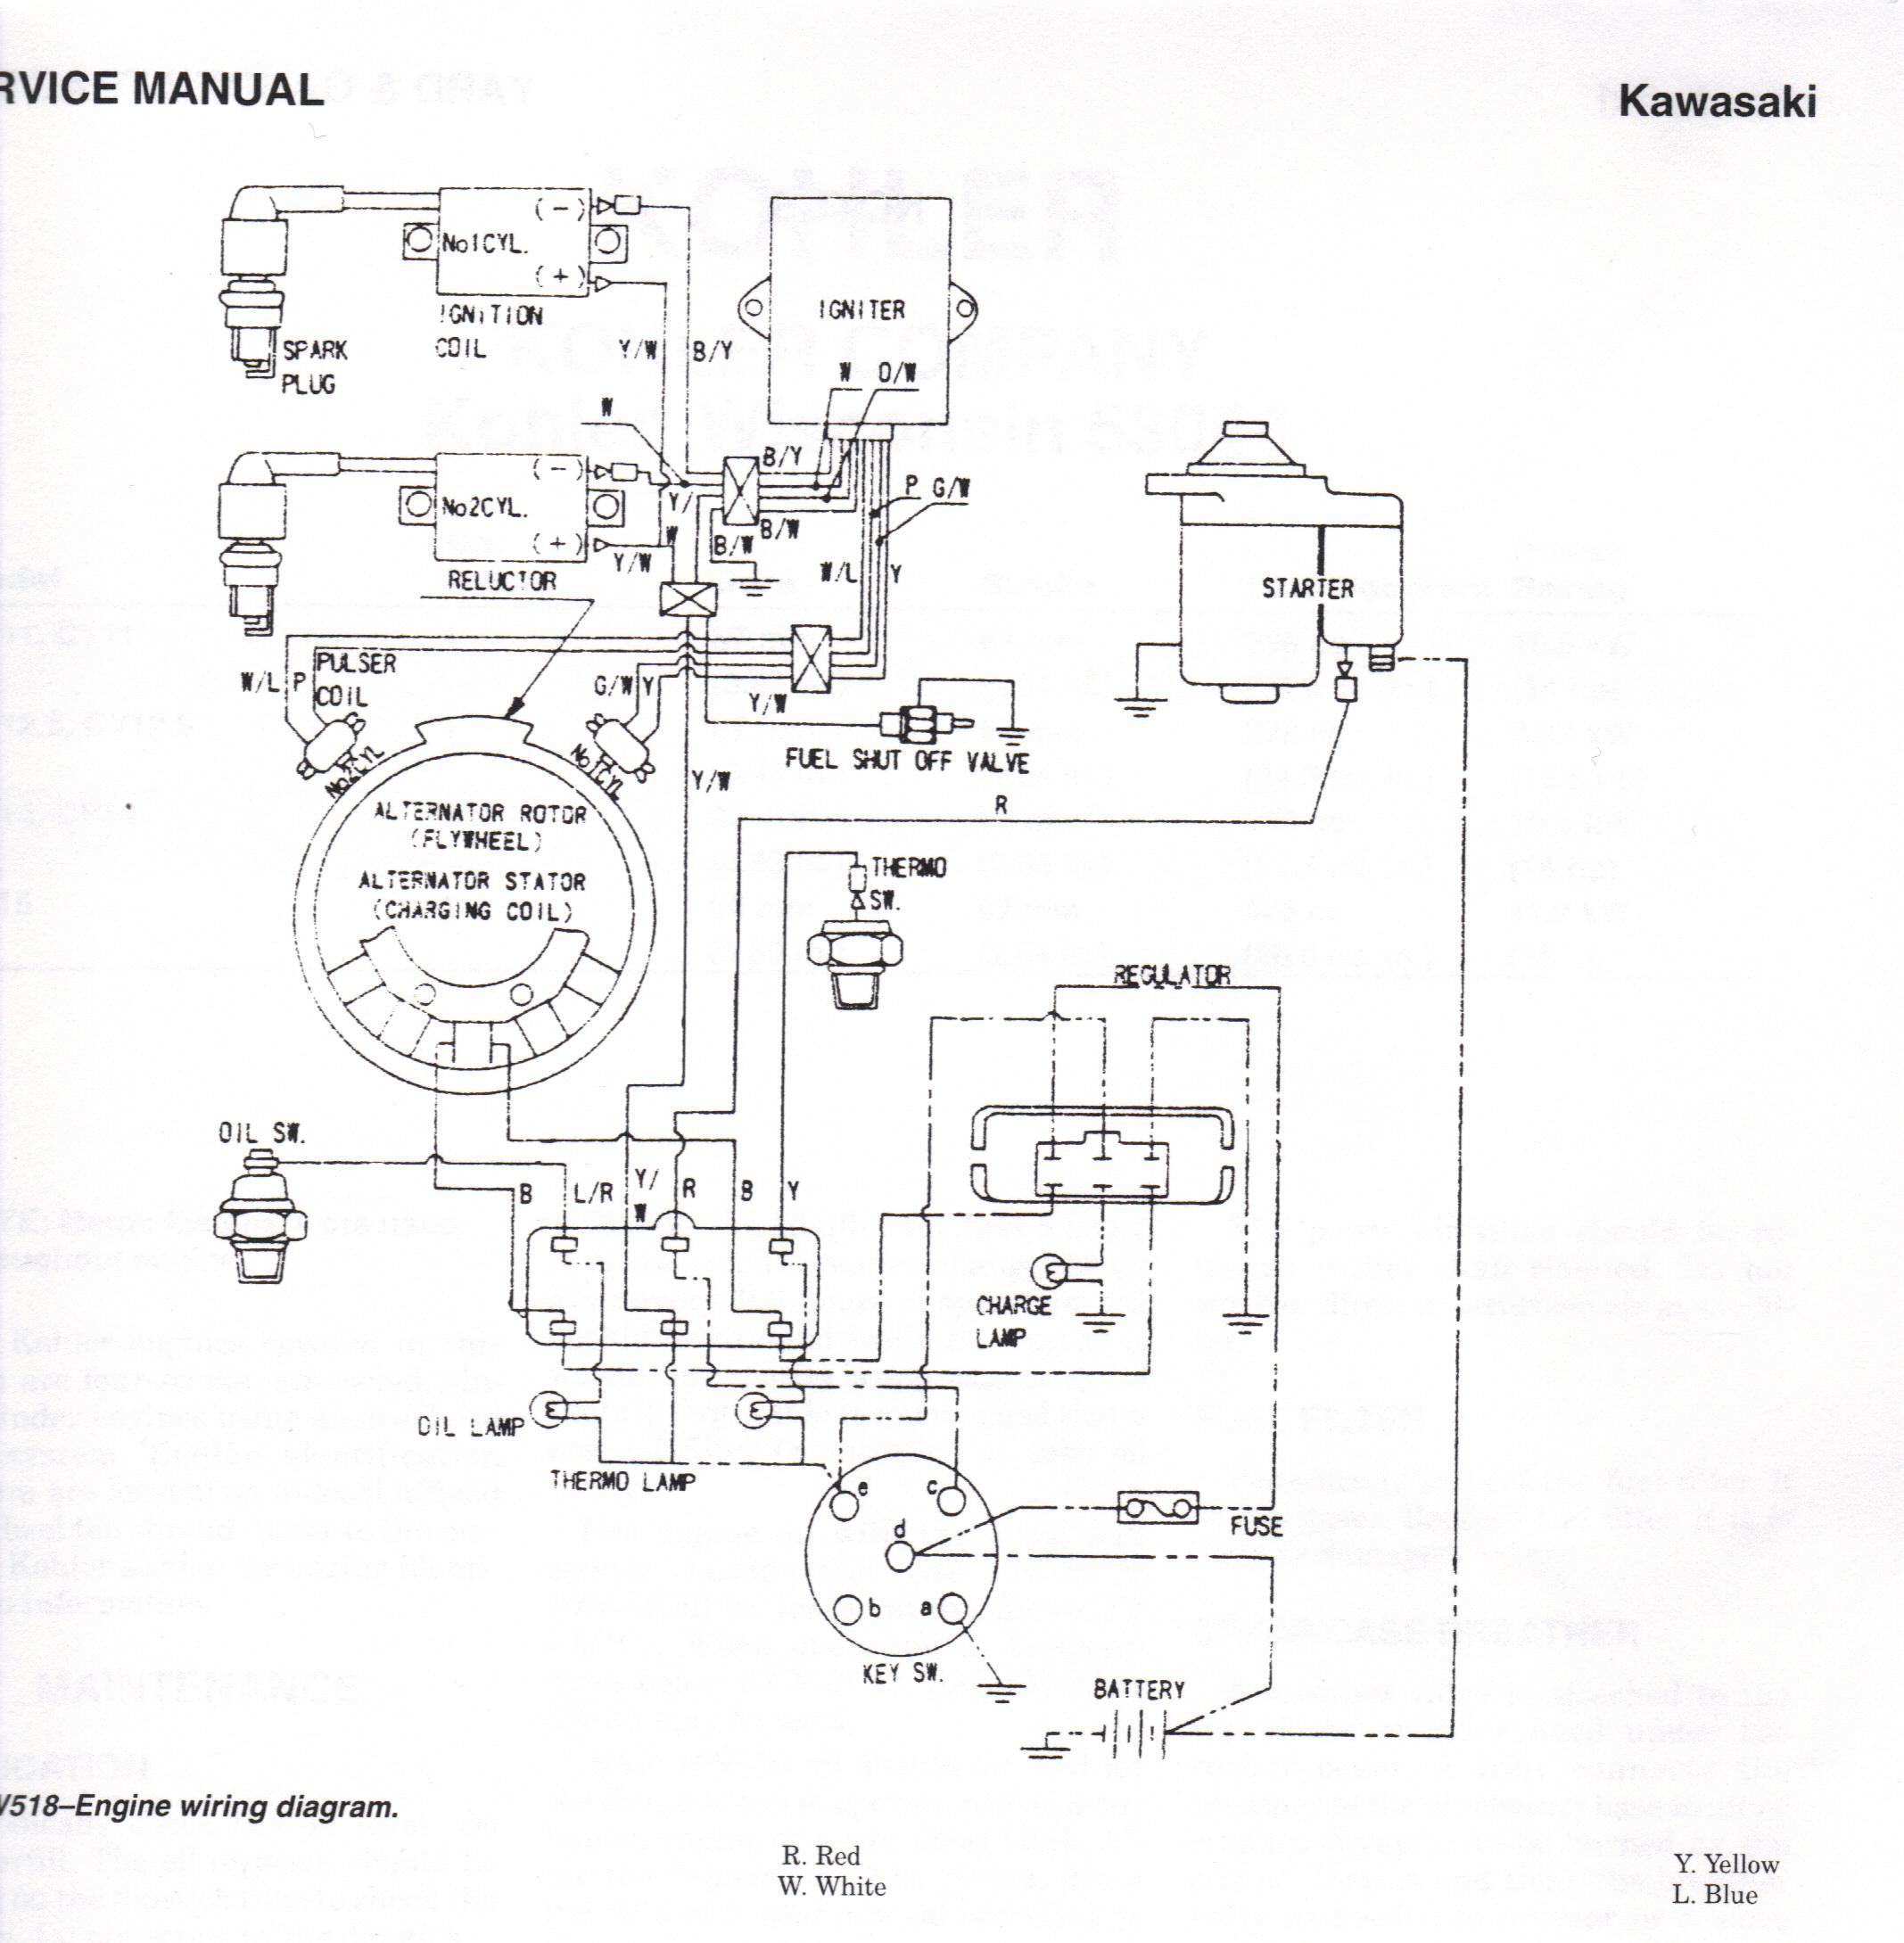 jd 445 garden tractor on startup engine misfiring on left side rh justanswer com John Deere Ignition Switch Diagram John Deere 3020 Electrical Diagram